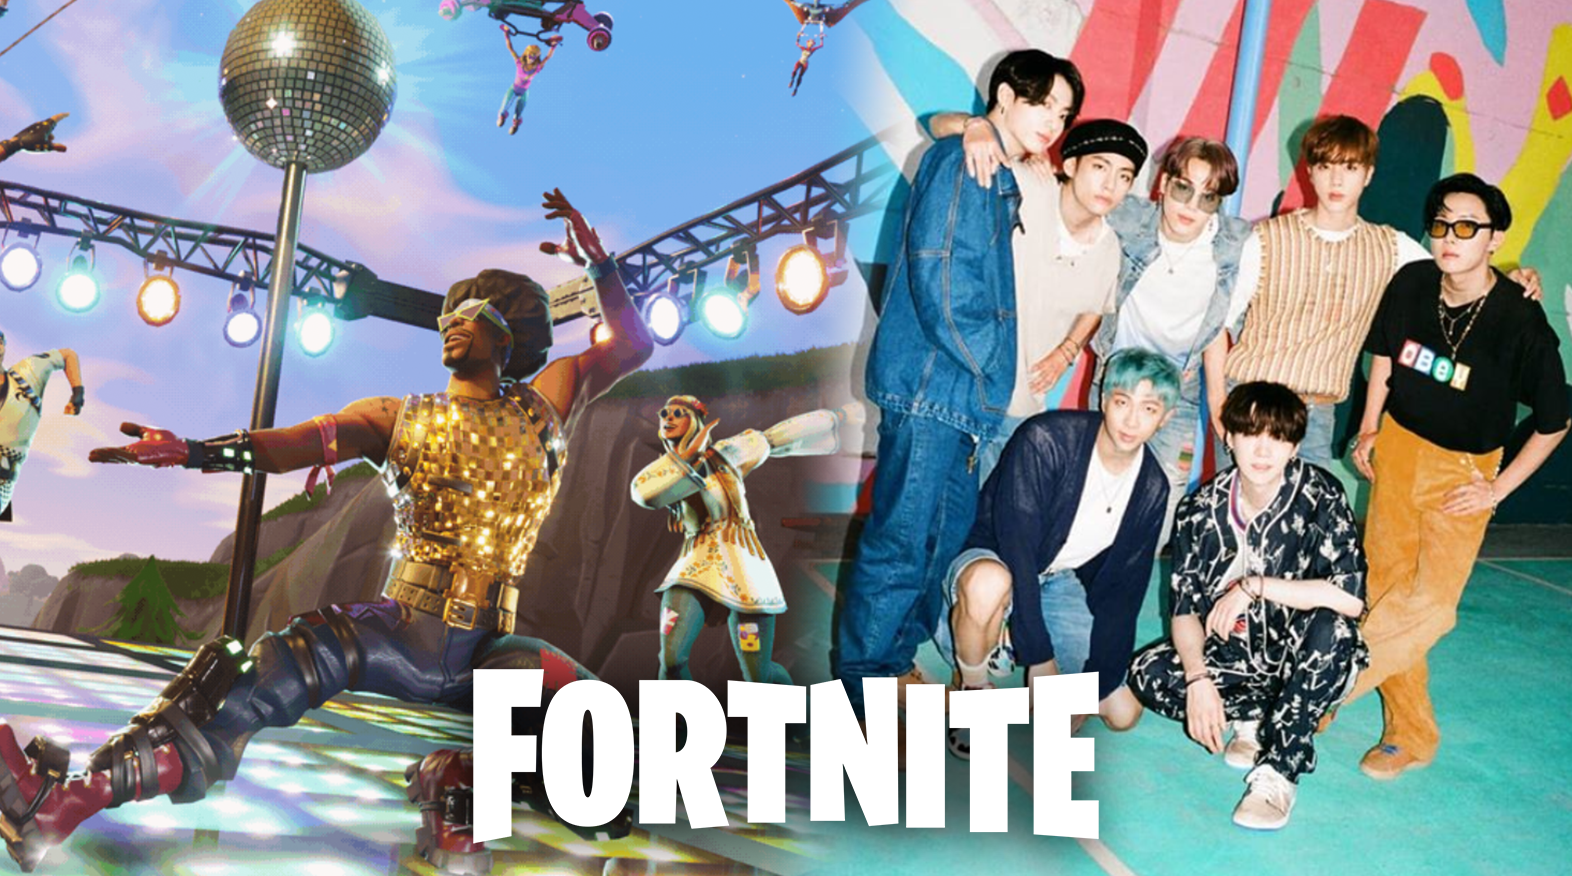 Fortnite gameplay / BTS photoshoot